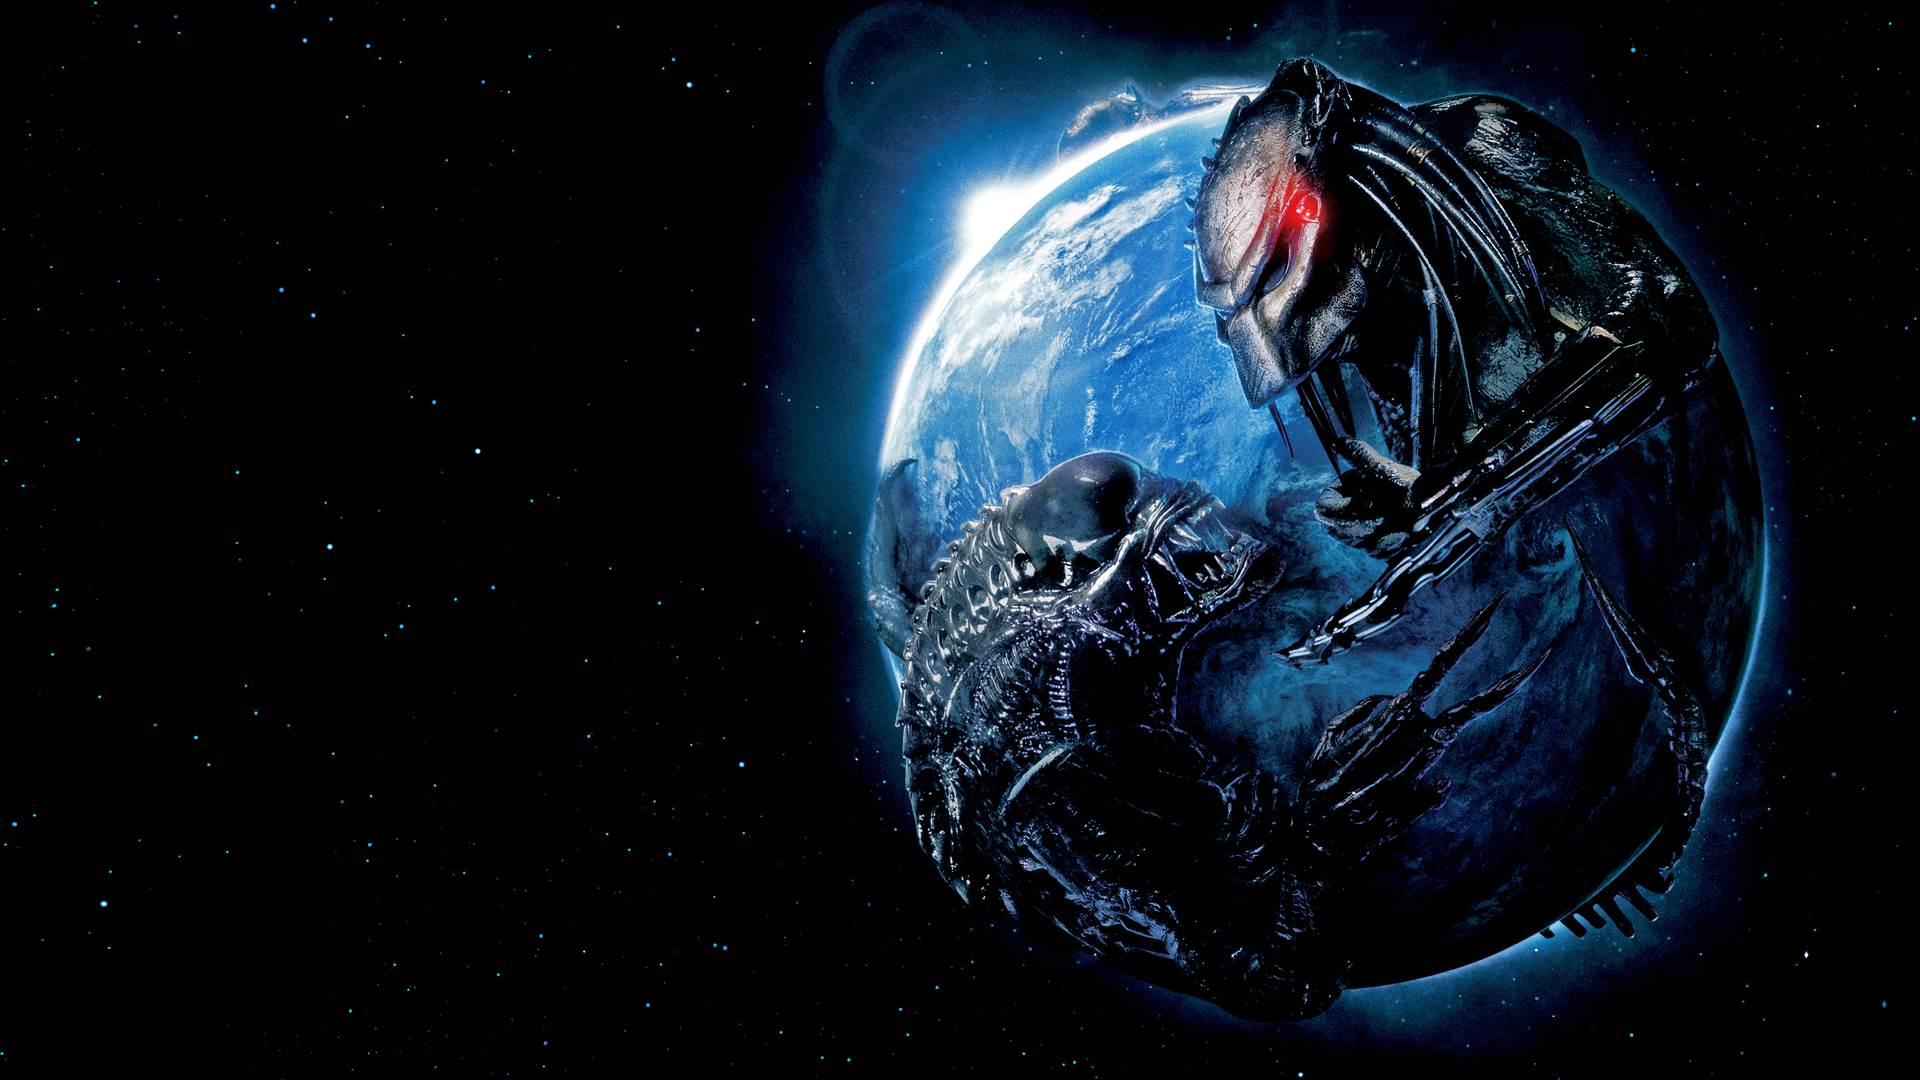 alien vs predator wallpapers desktop : movies wallpaper – engchou